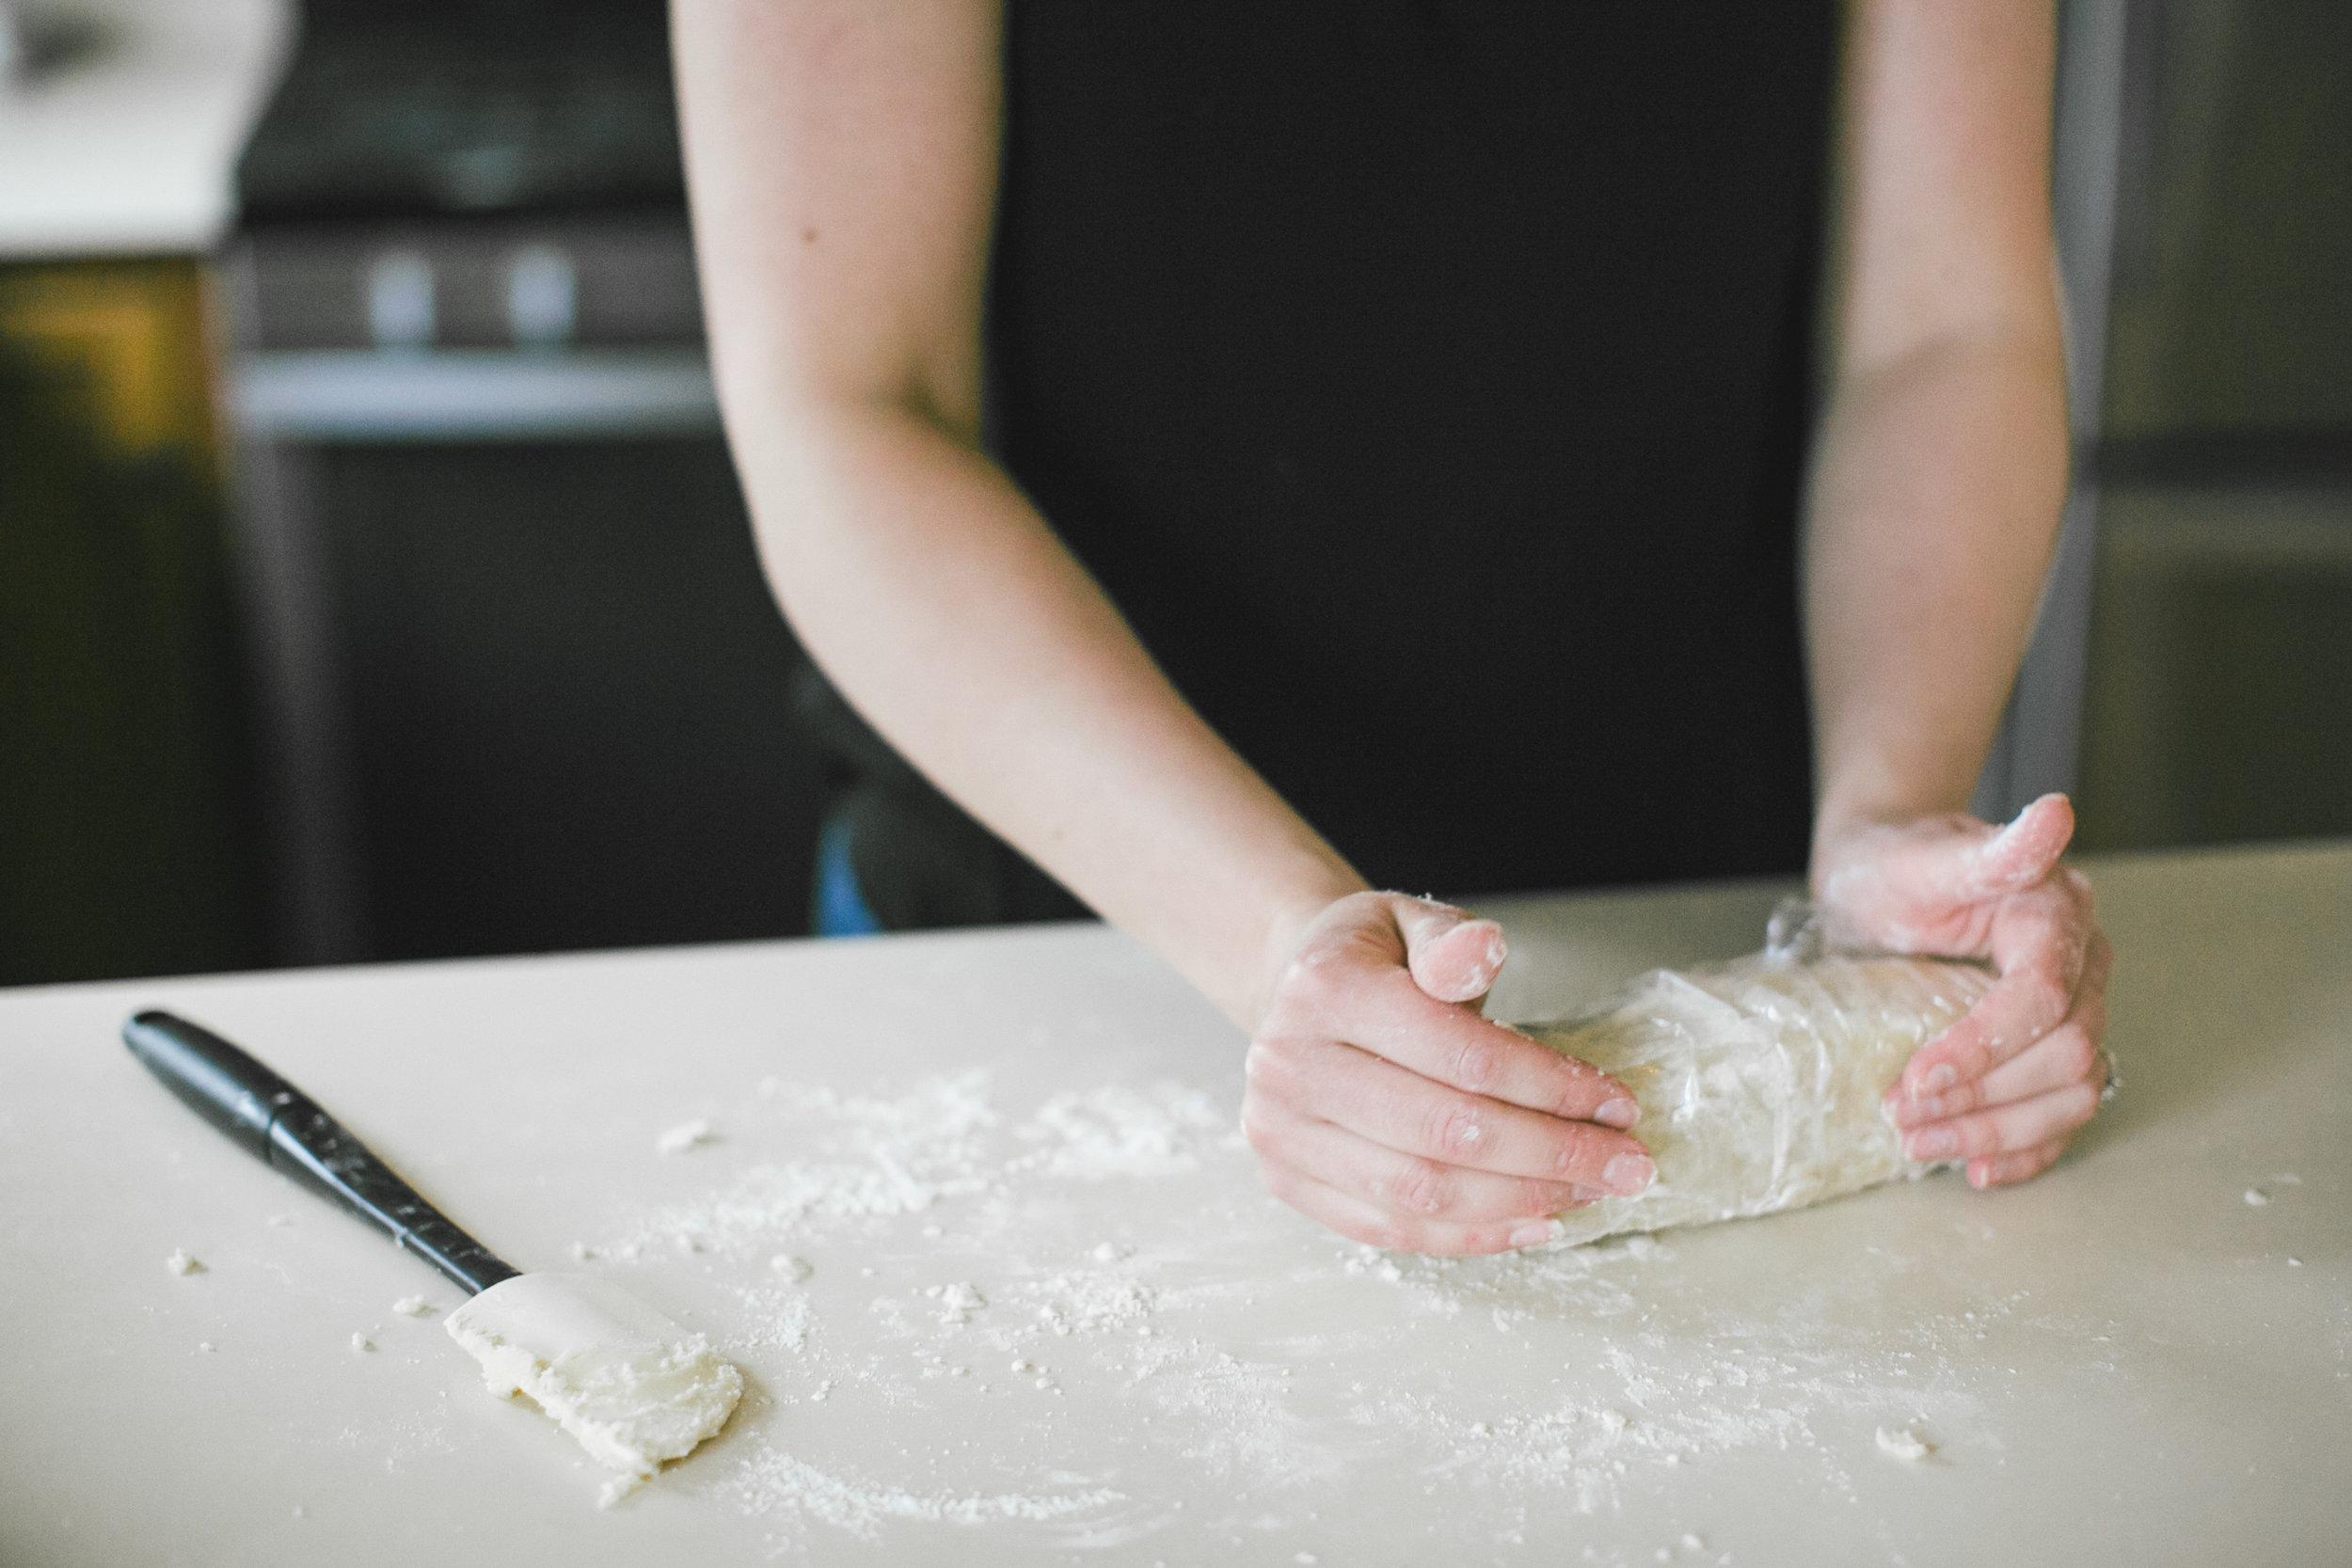 Chocolate Dipped Almond Shortbread | Sarah J. Hauser #baking #foodphotography #cookies #shortbread